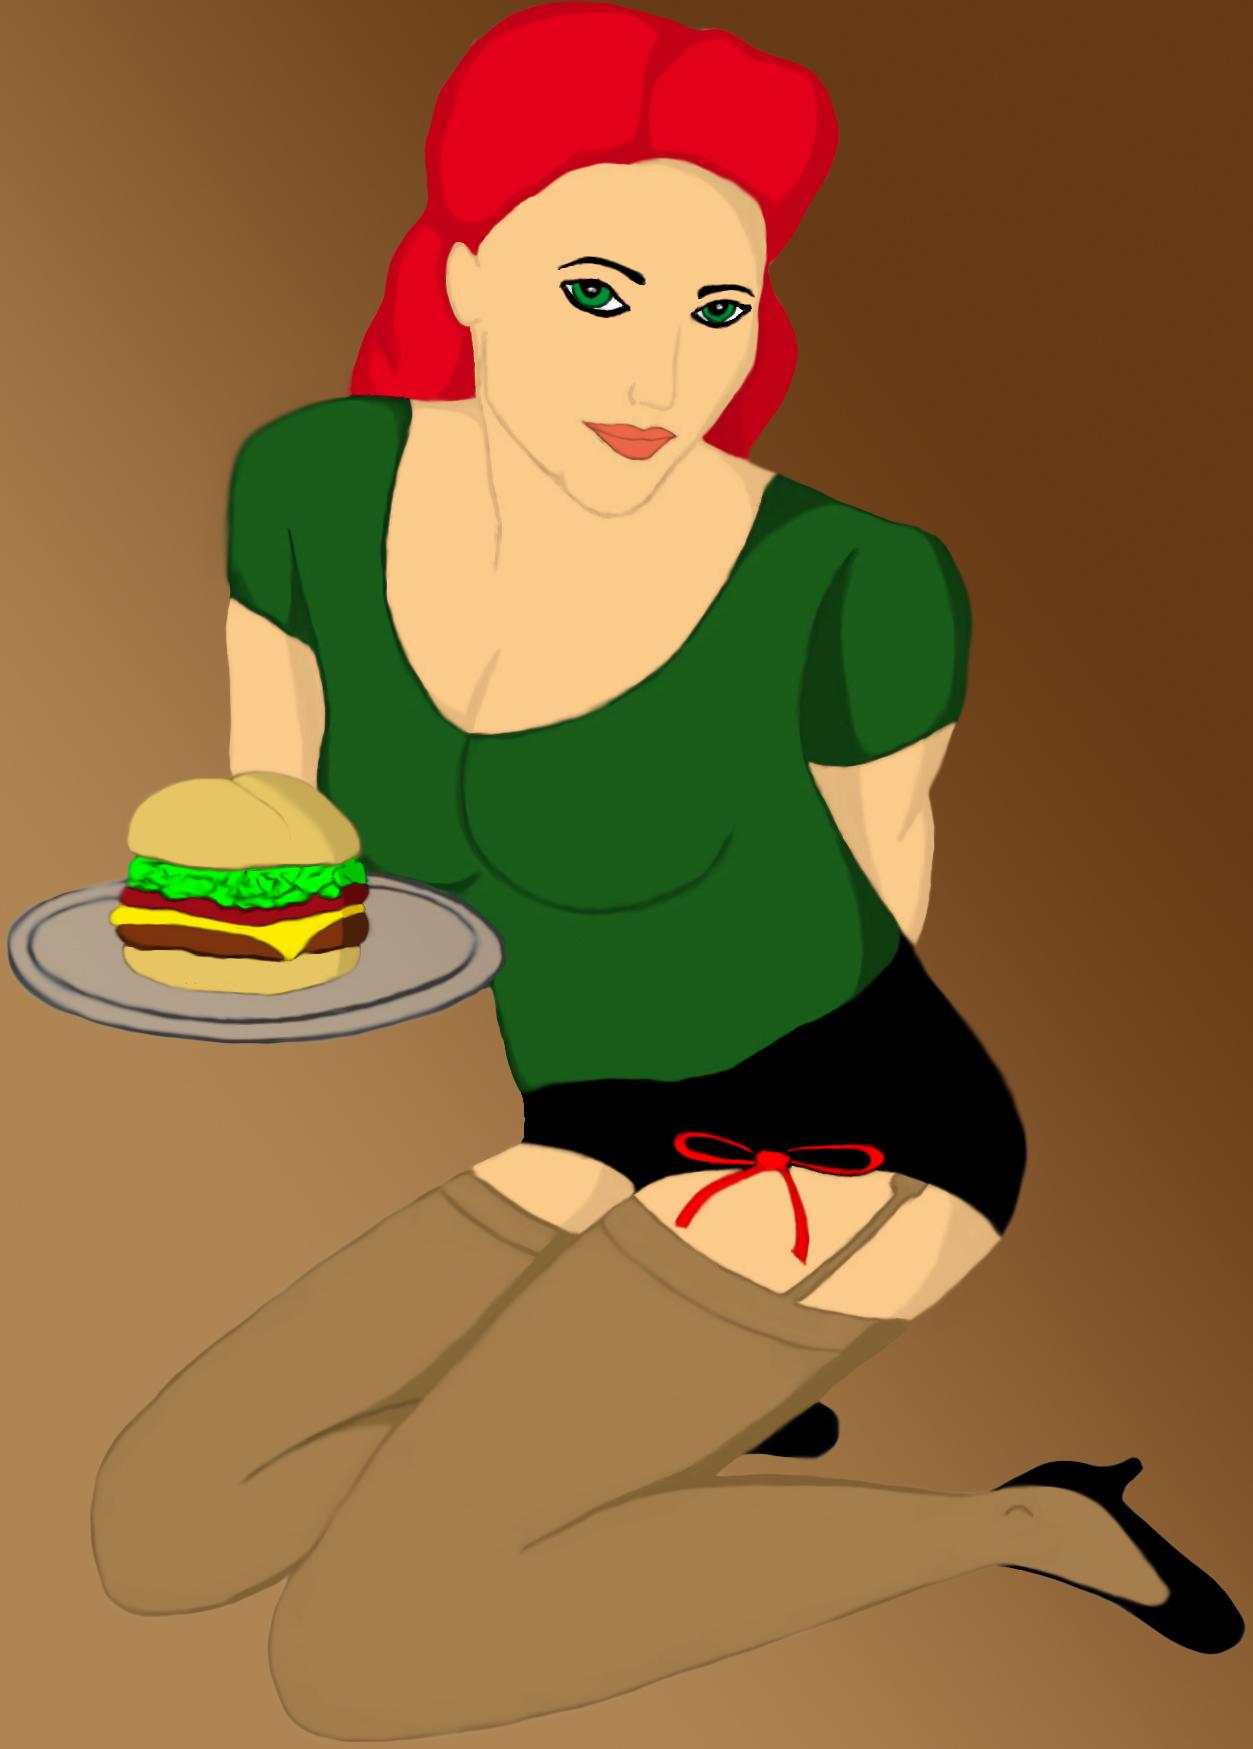 Pin Up Girl with Burger